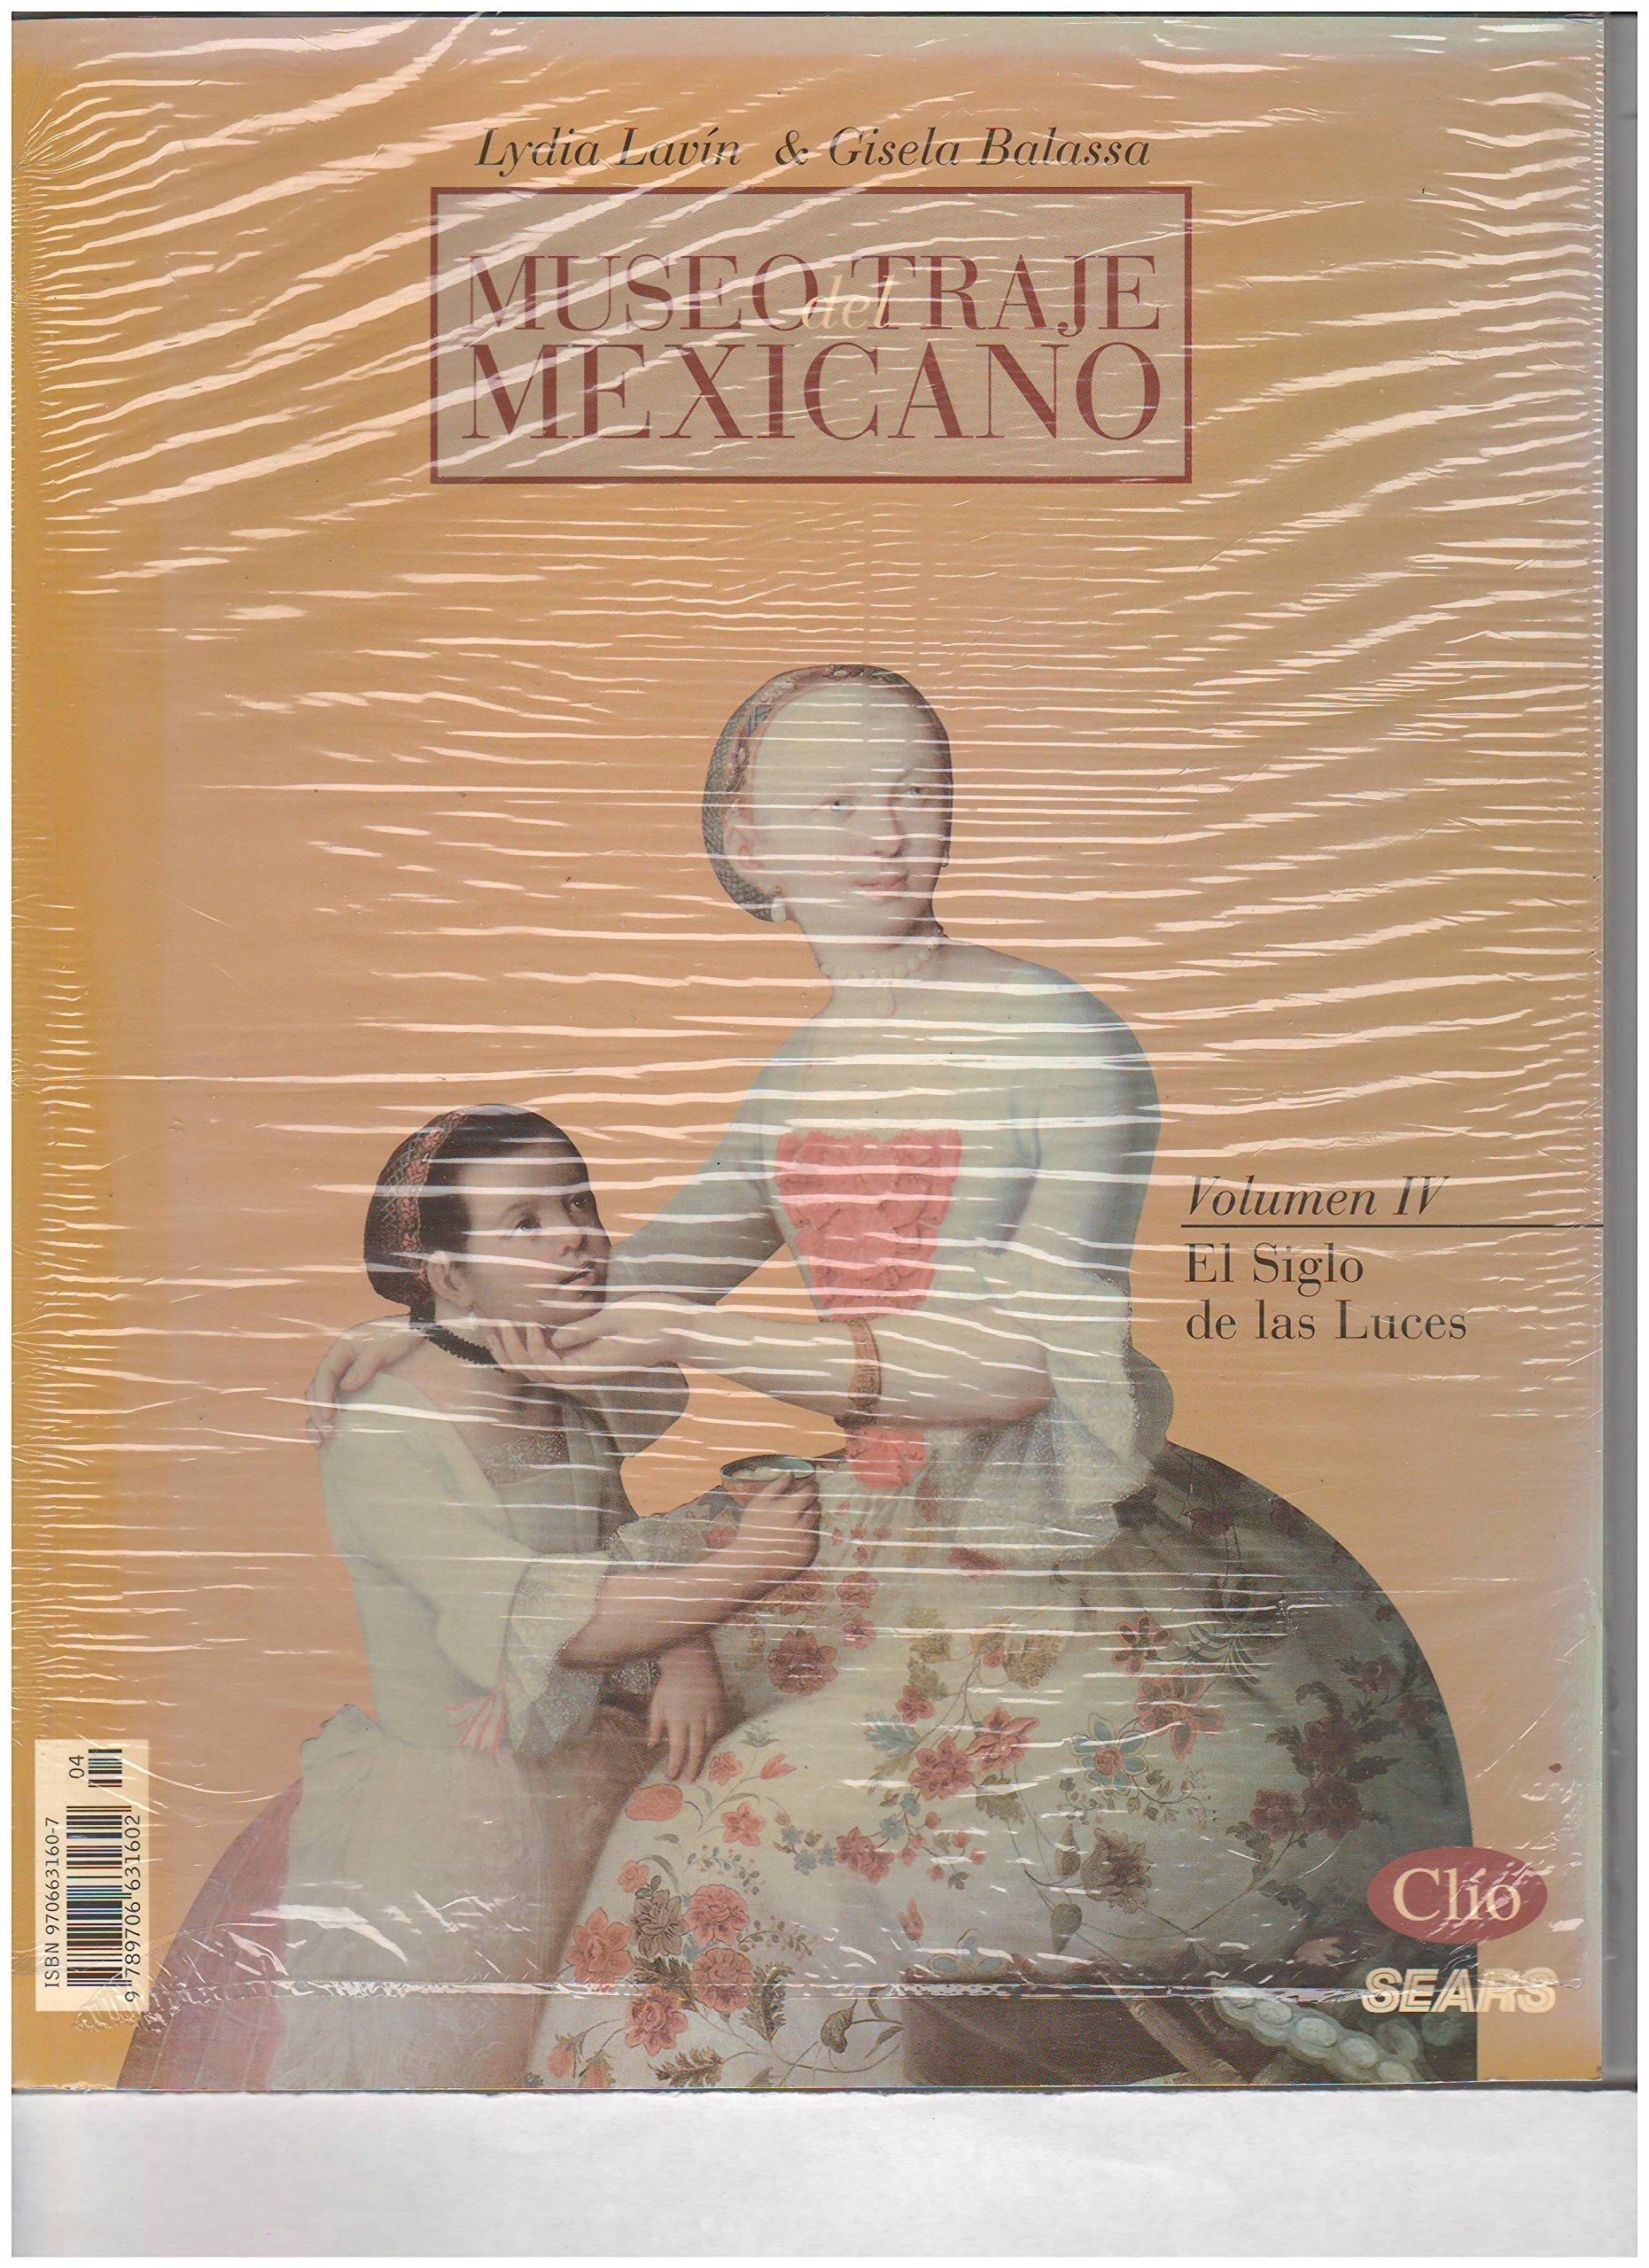 Museo del traje mexicano (Spanish Edition): Lydia Lavín ...